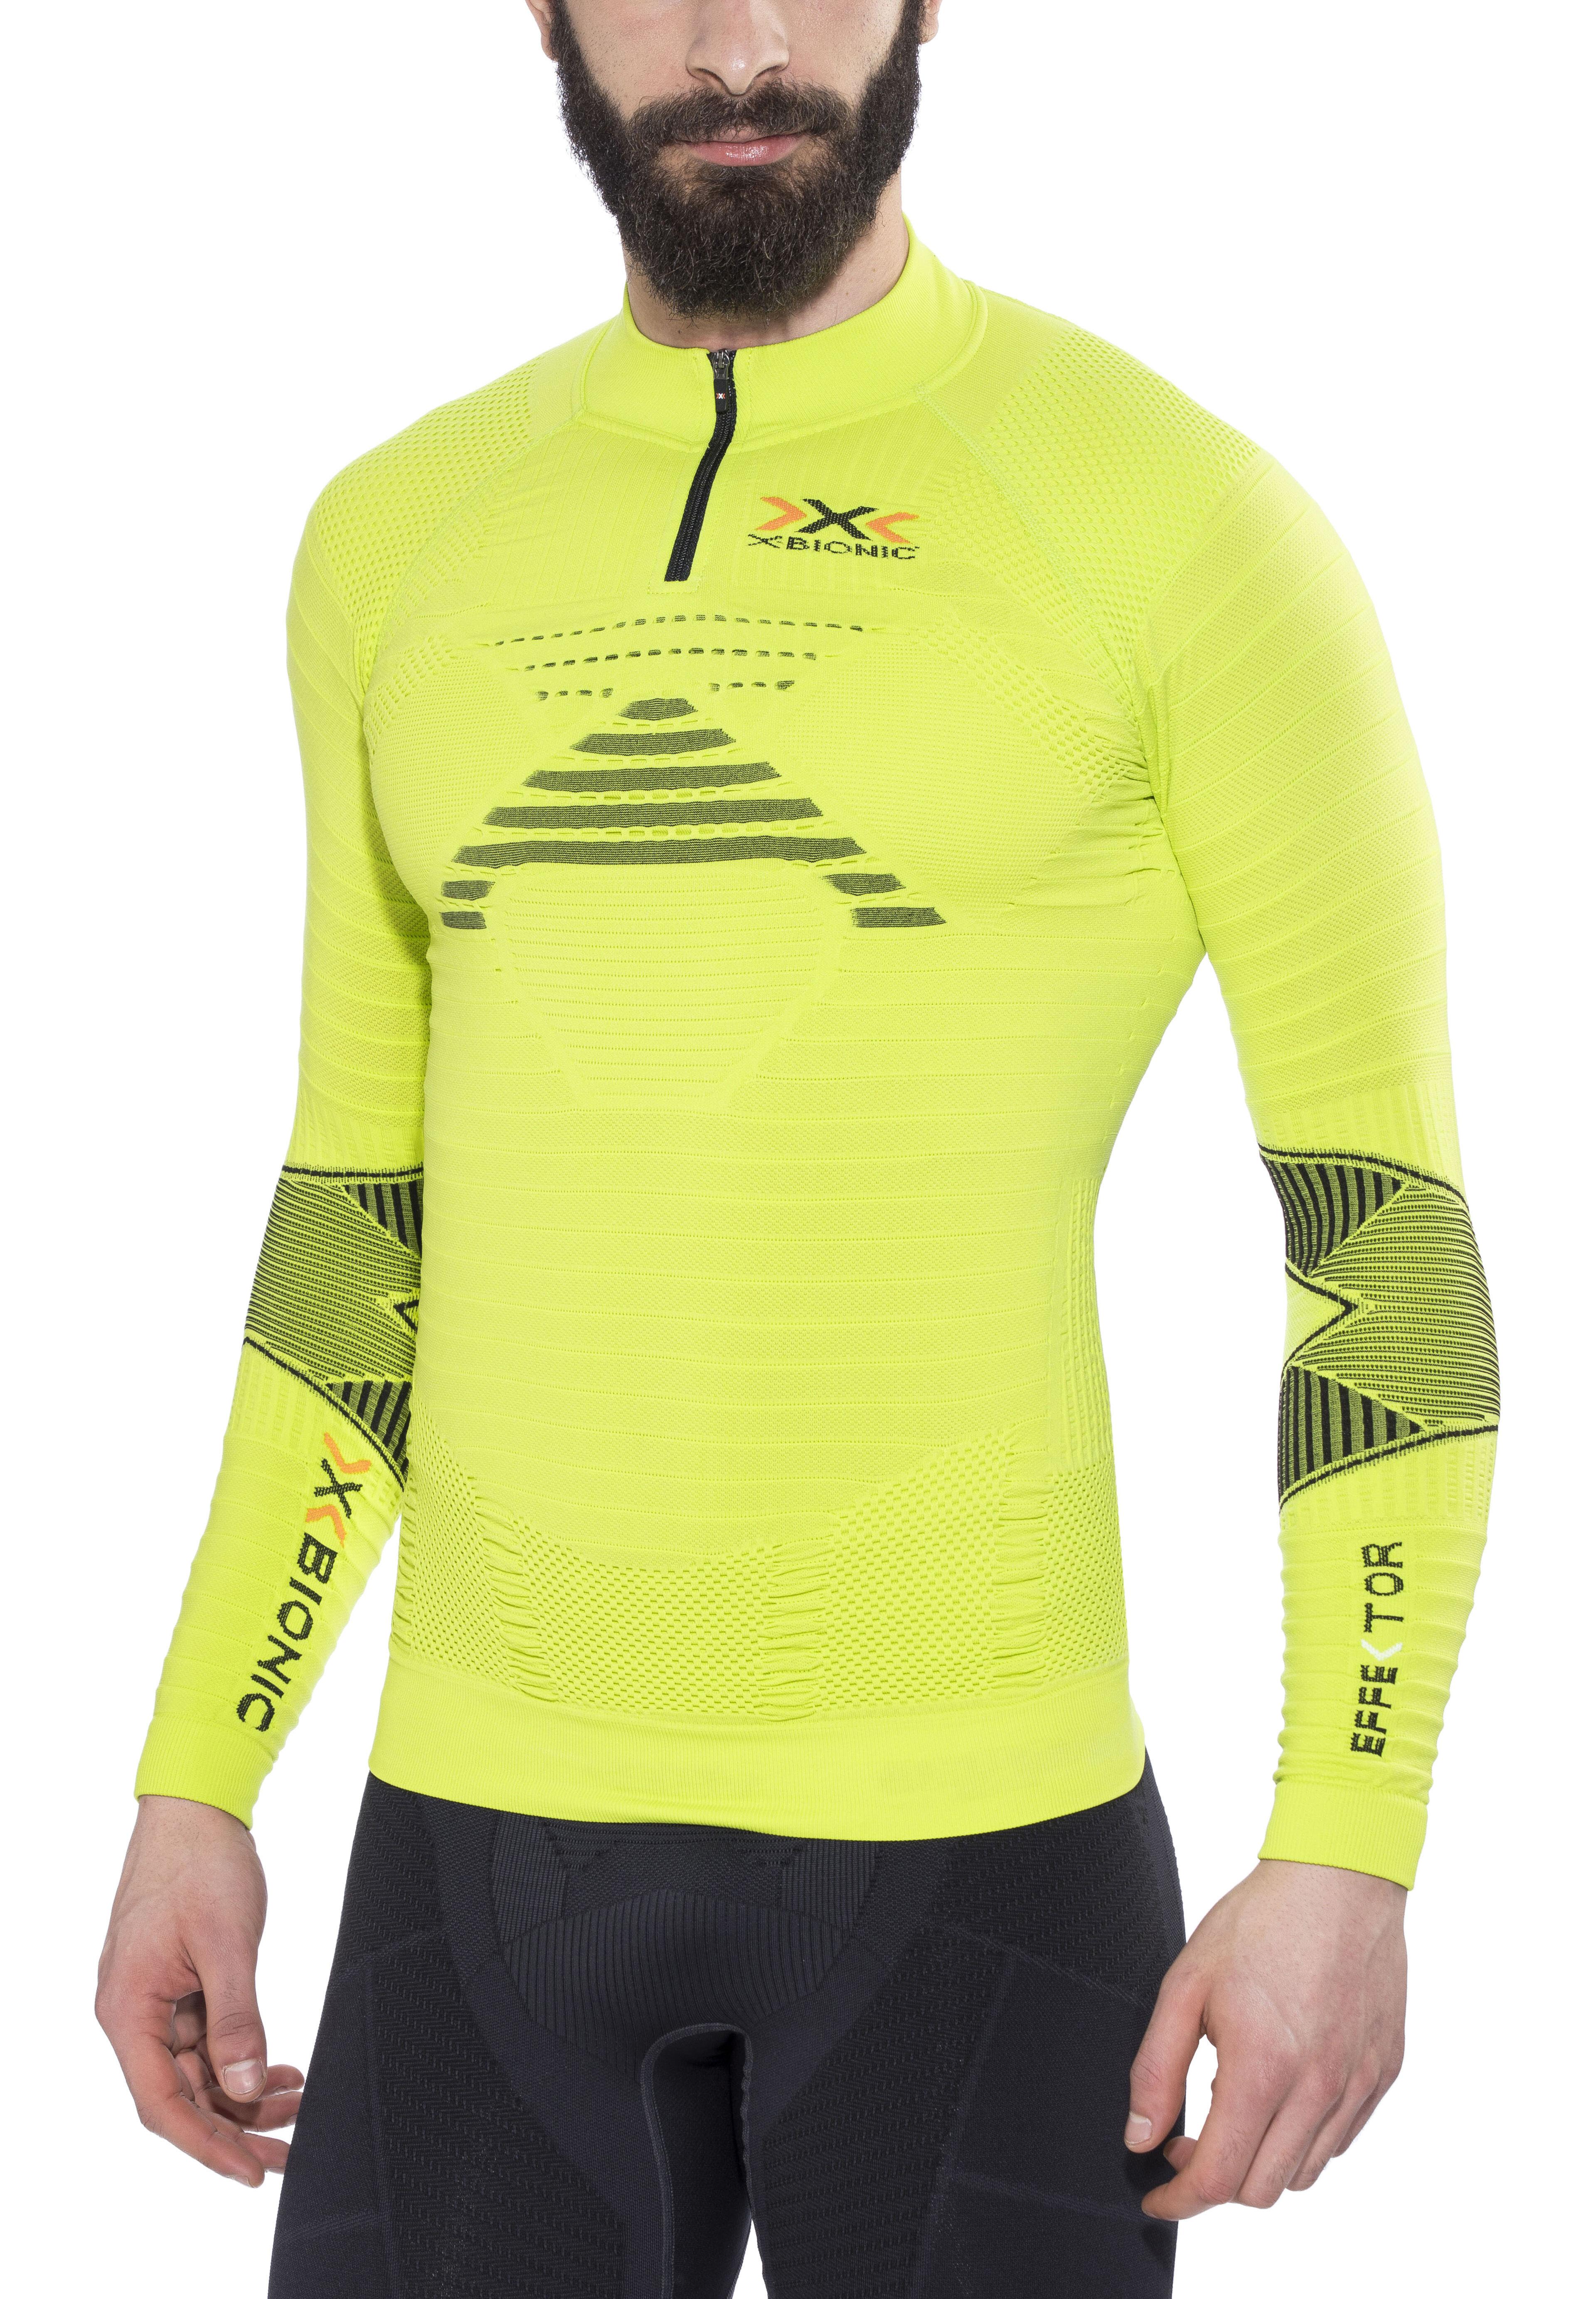 dc99cbd7cb4 X-Bionic Effektor Trail Running - T-shirt manches longues running Homme -  jaune